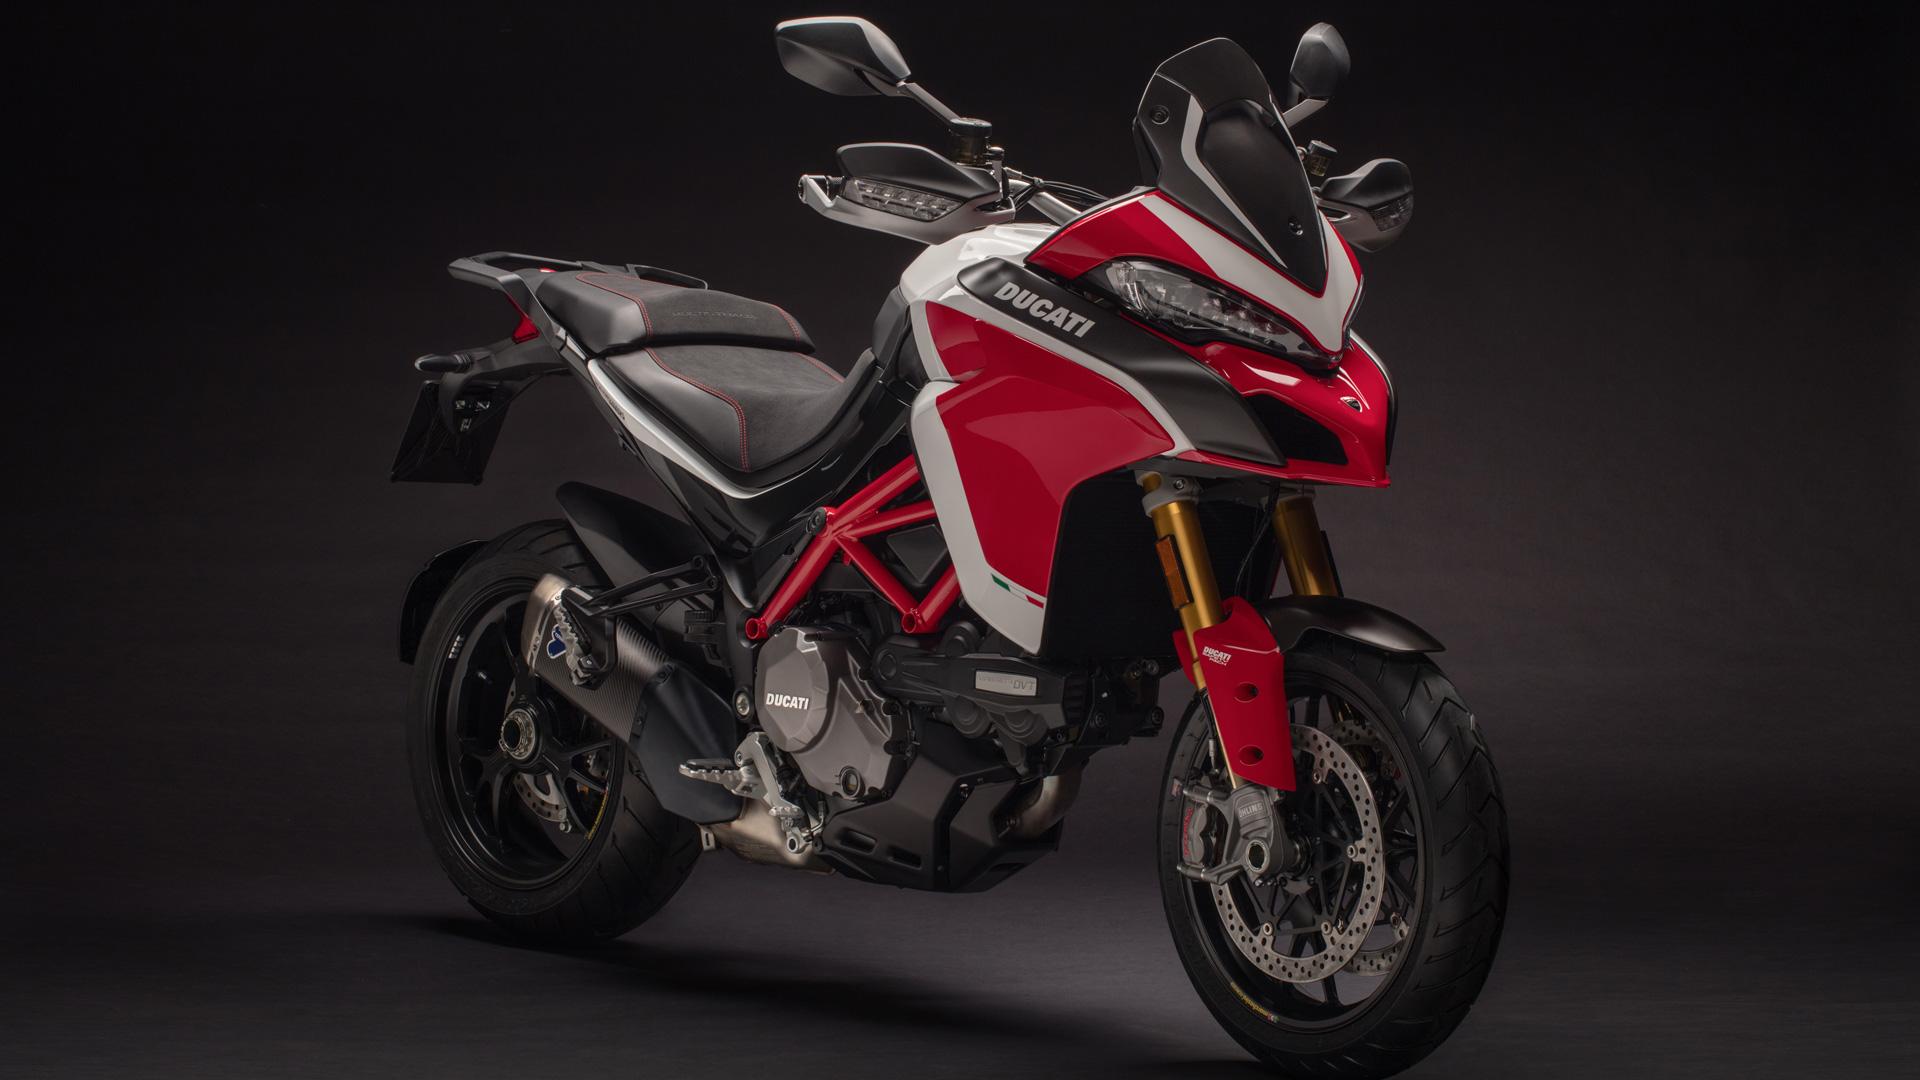 Ducati M821 Black